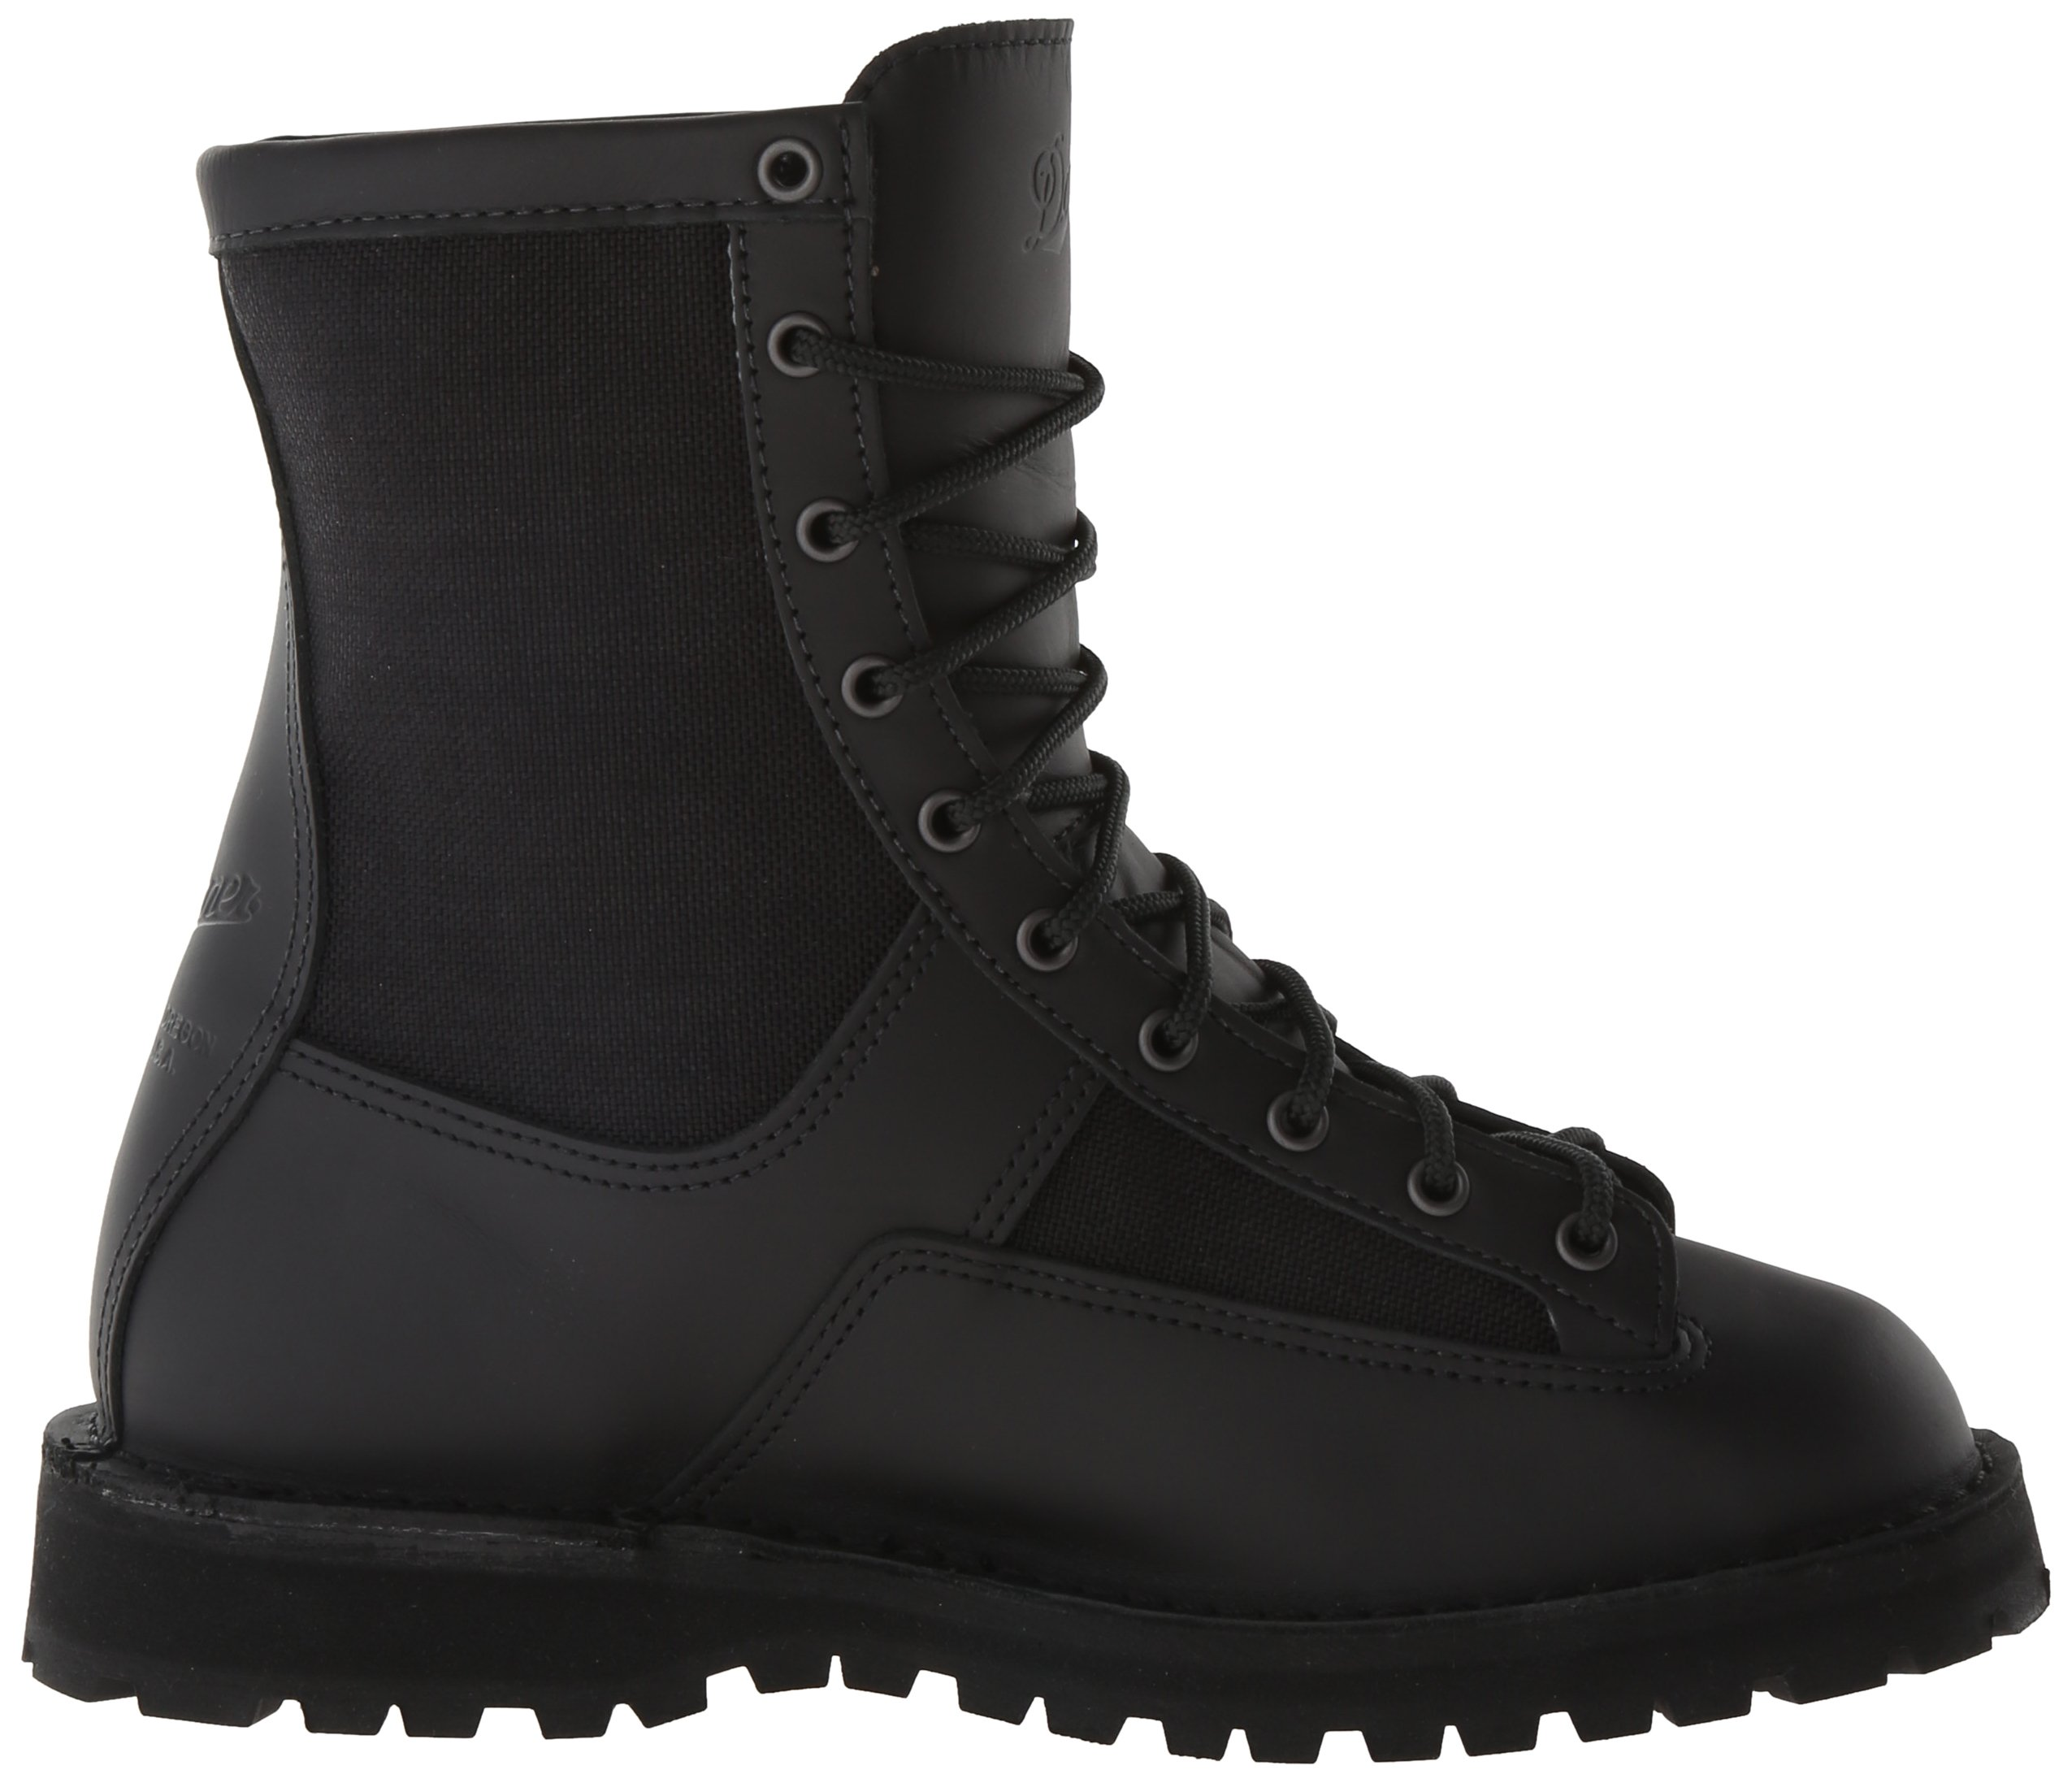 Danner Men's Acadia 8'' 200G Military and Tactical Boot, Black, 13 B US by Danner (Image #6)